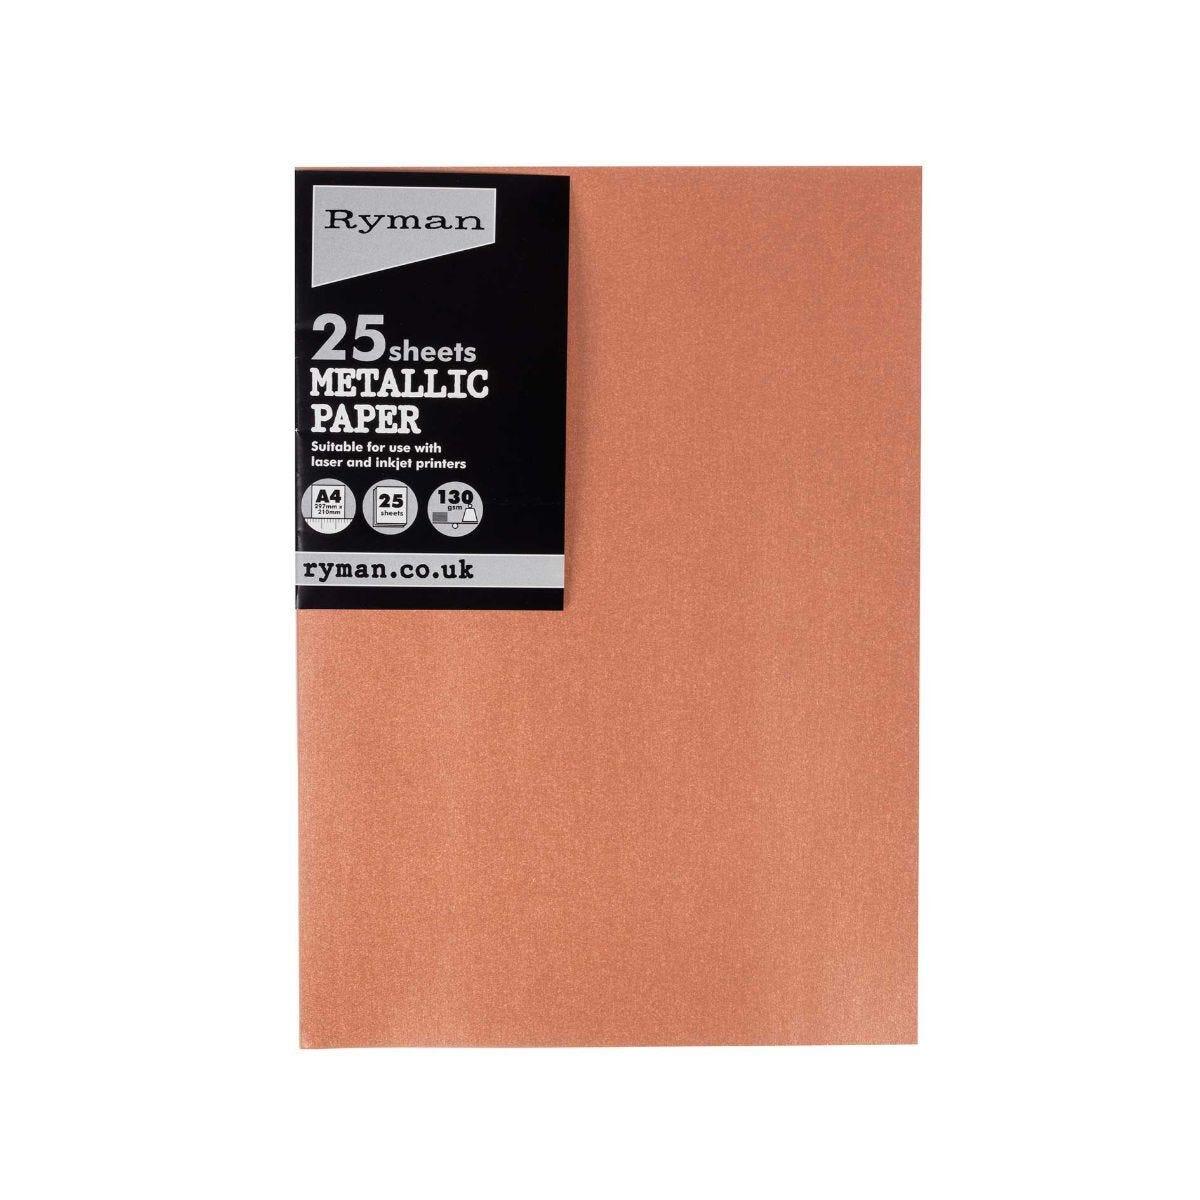 Ryman Metallic Paper A4 Pack of 25 Rose Gold